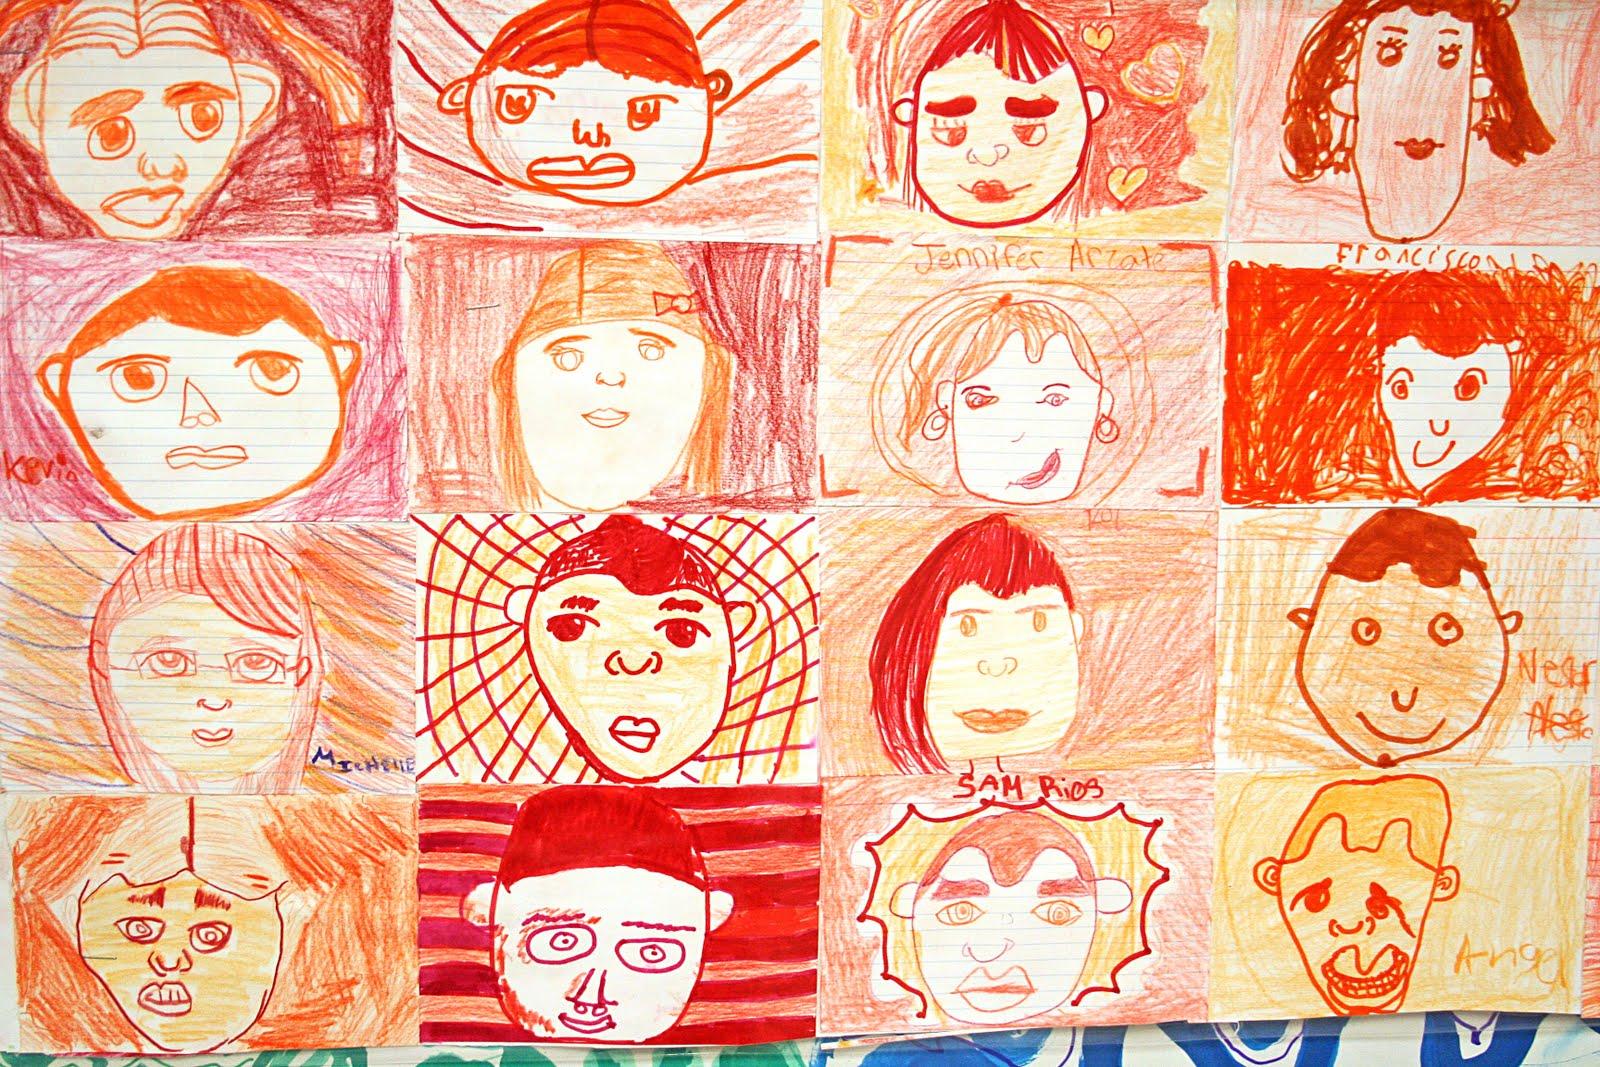 Color wheel art projects for kids - Color Wheel Self Portrait Mural